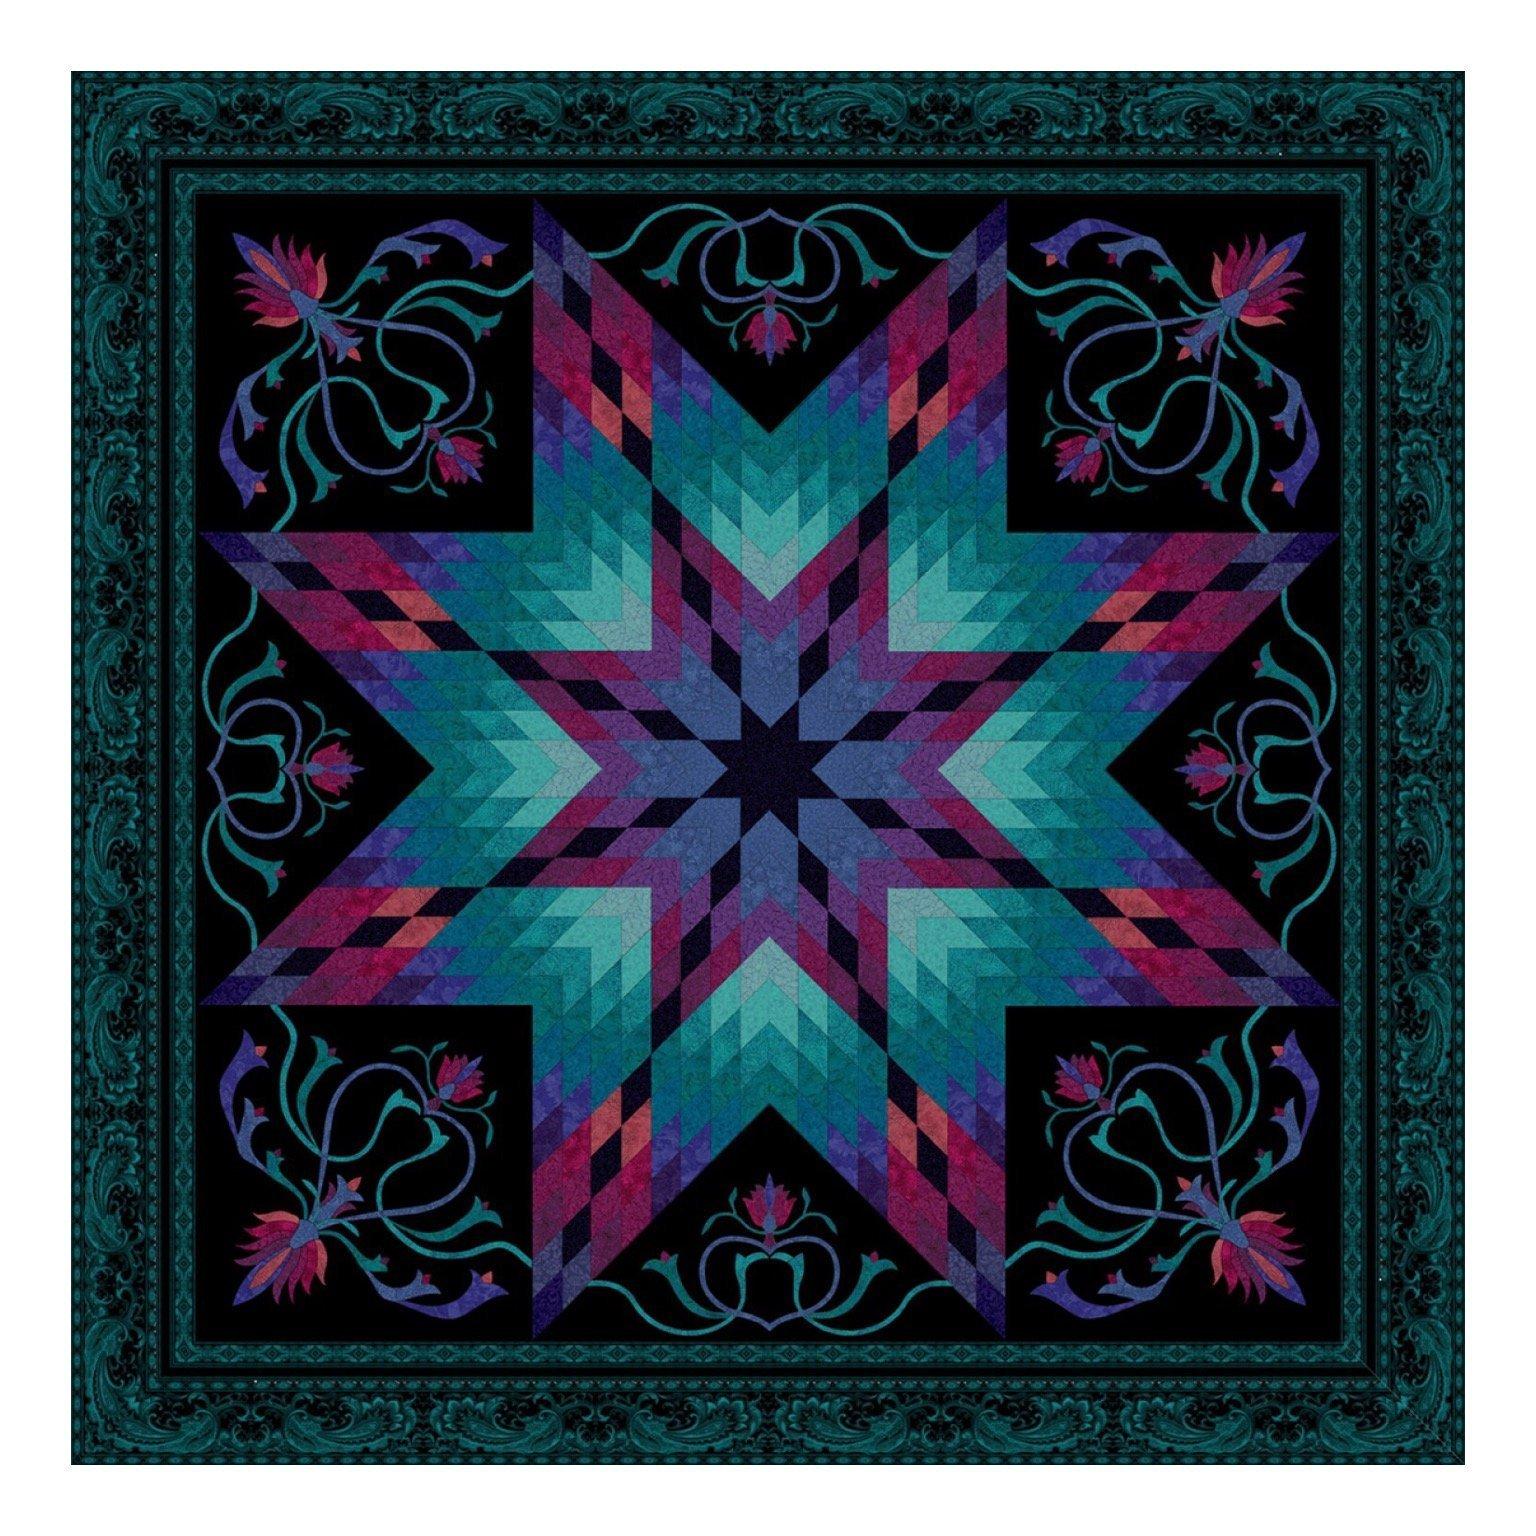 Lotus Peacock Quilt Kit by Jinny Beyer for RJR Fabrics